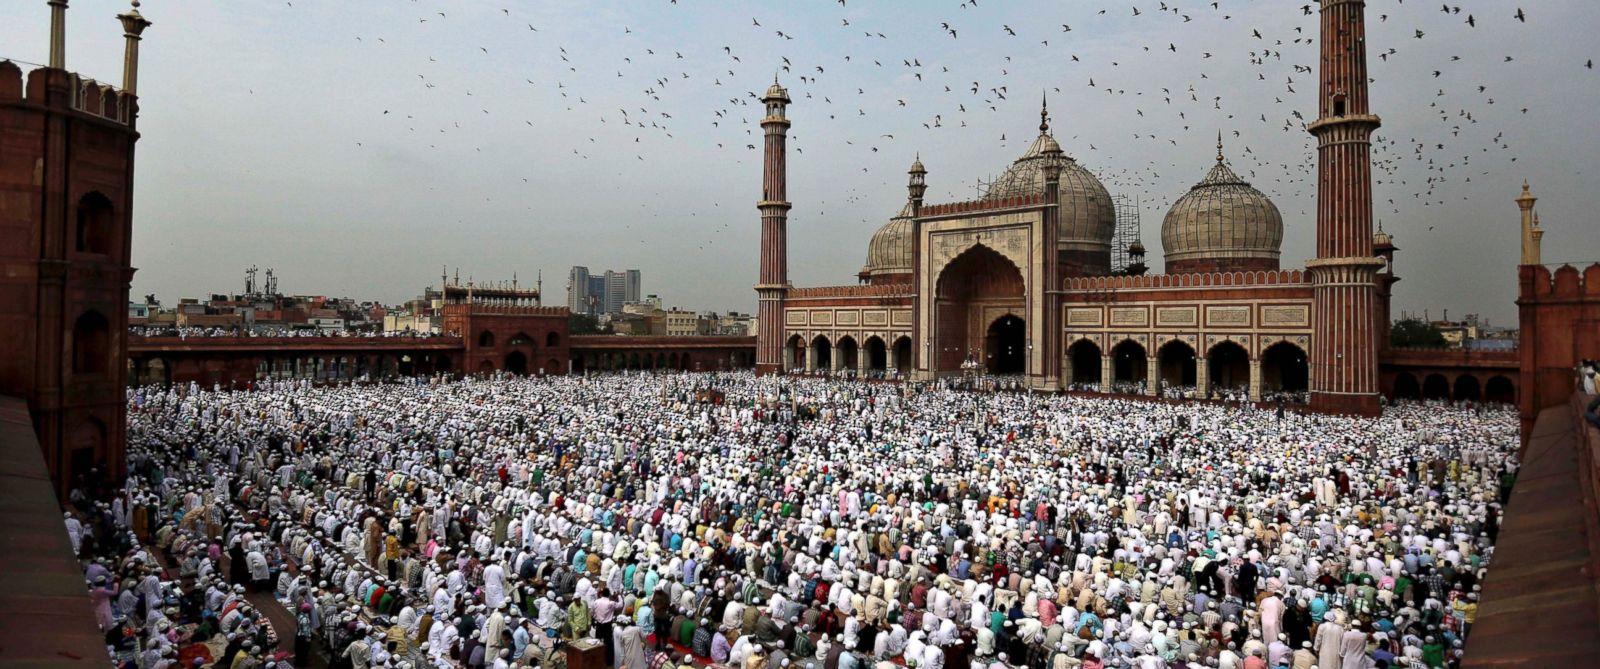 Muslim World Celebrates End of Ramadan With Eid al-Fitr - ABC News